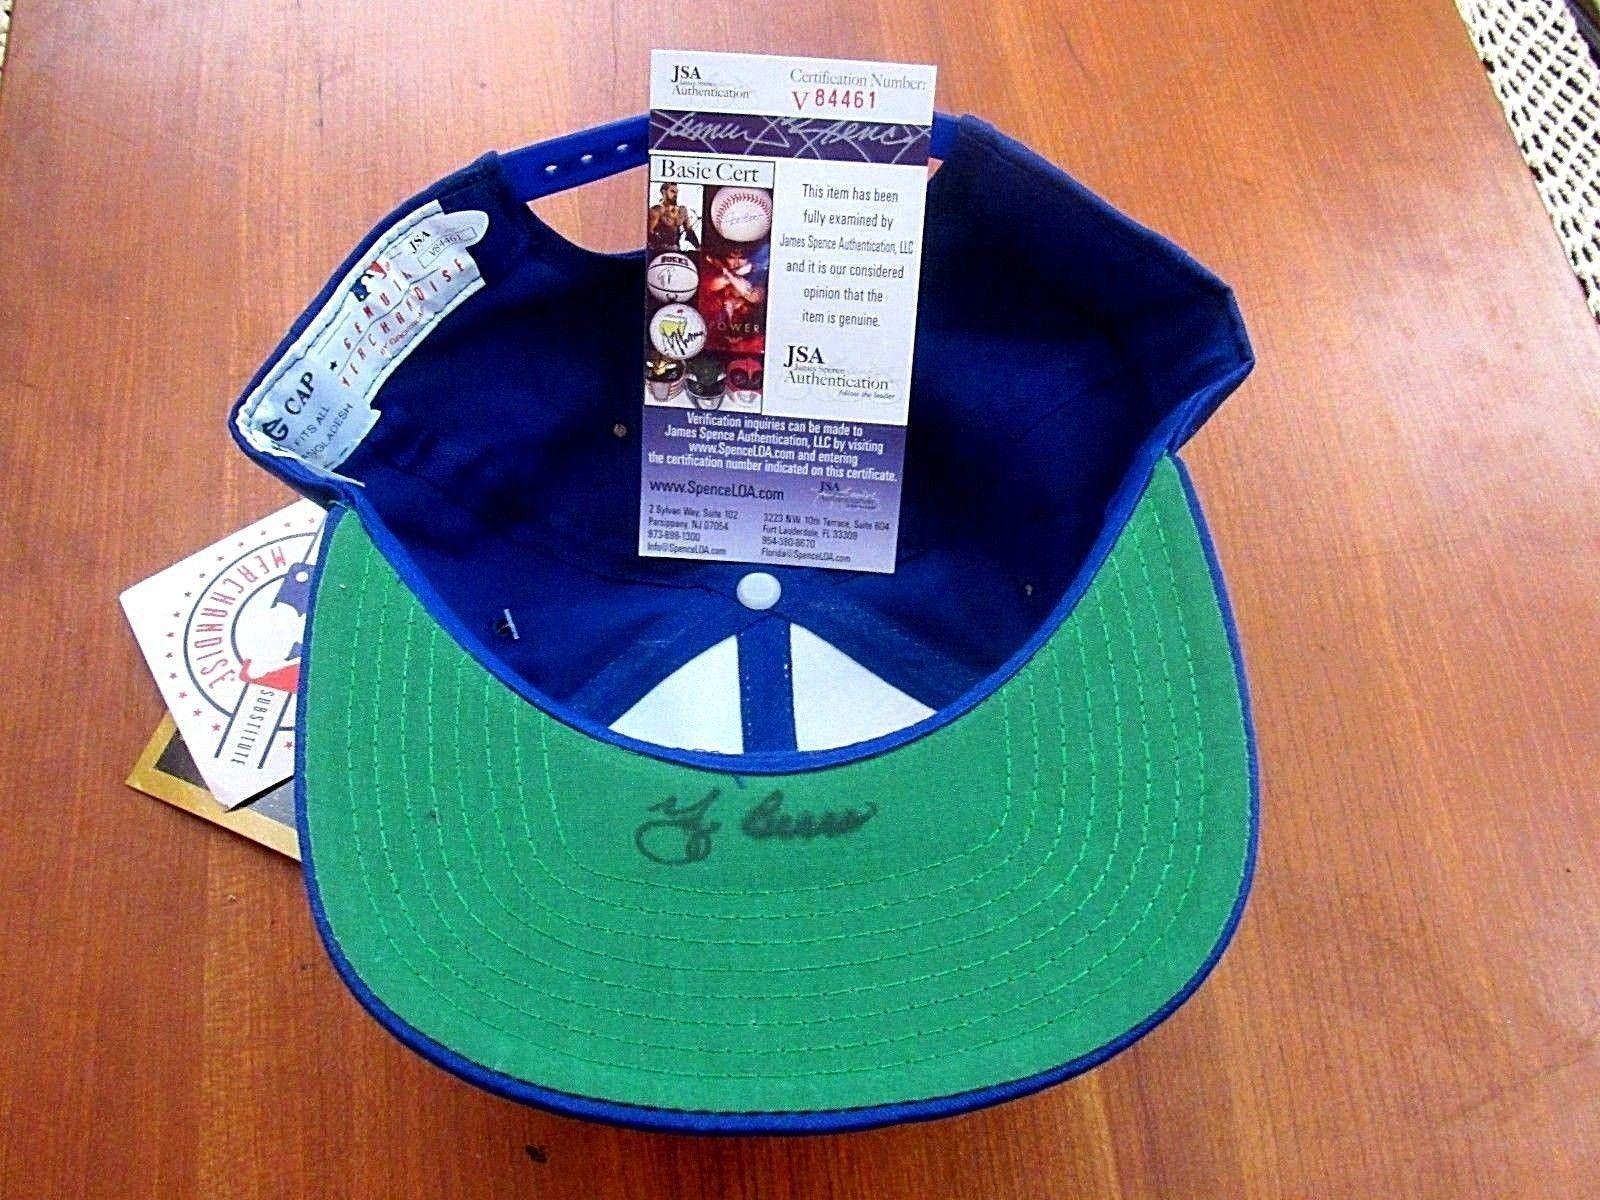 Yogi Berra 3x Al Mvp & 13x Wsc Mets Yankees Hof Catcher Signed Auto Cap JSA Certified Autographed Hats